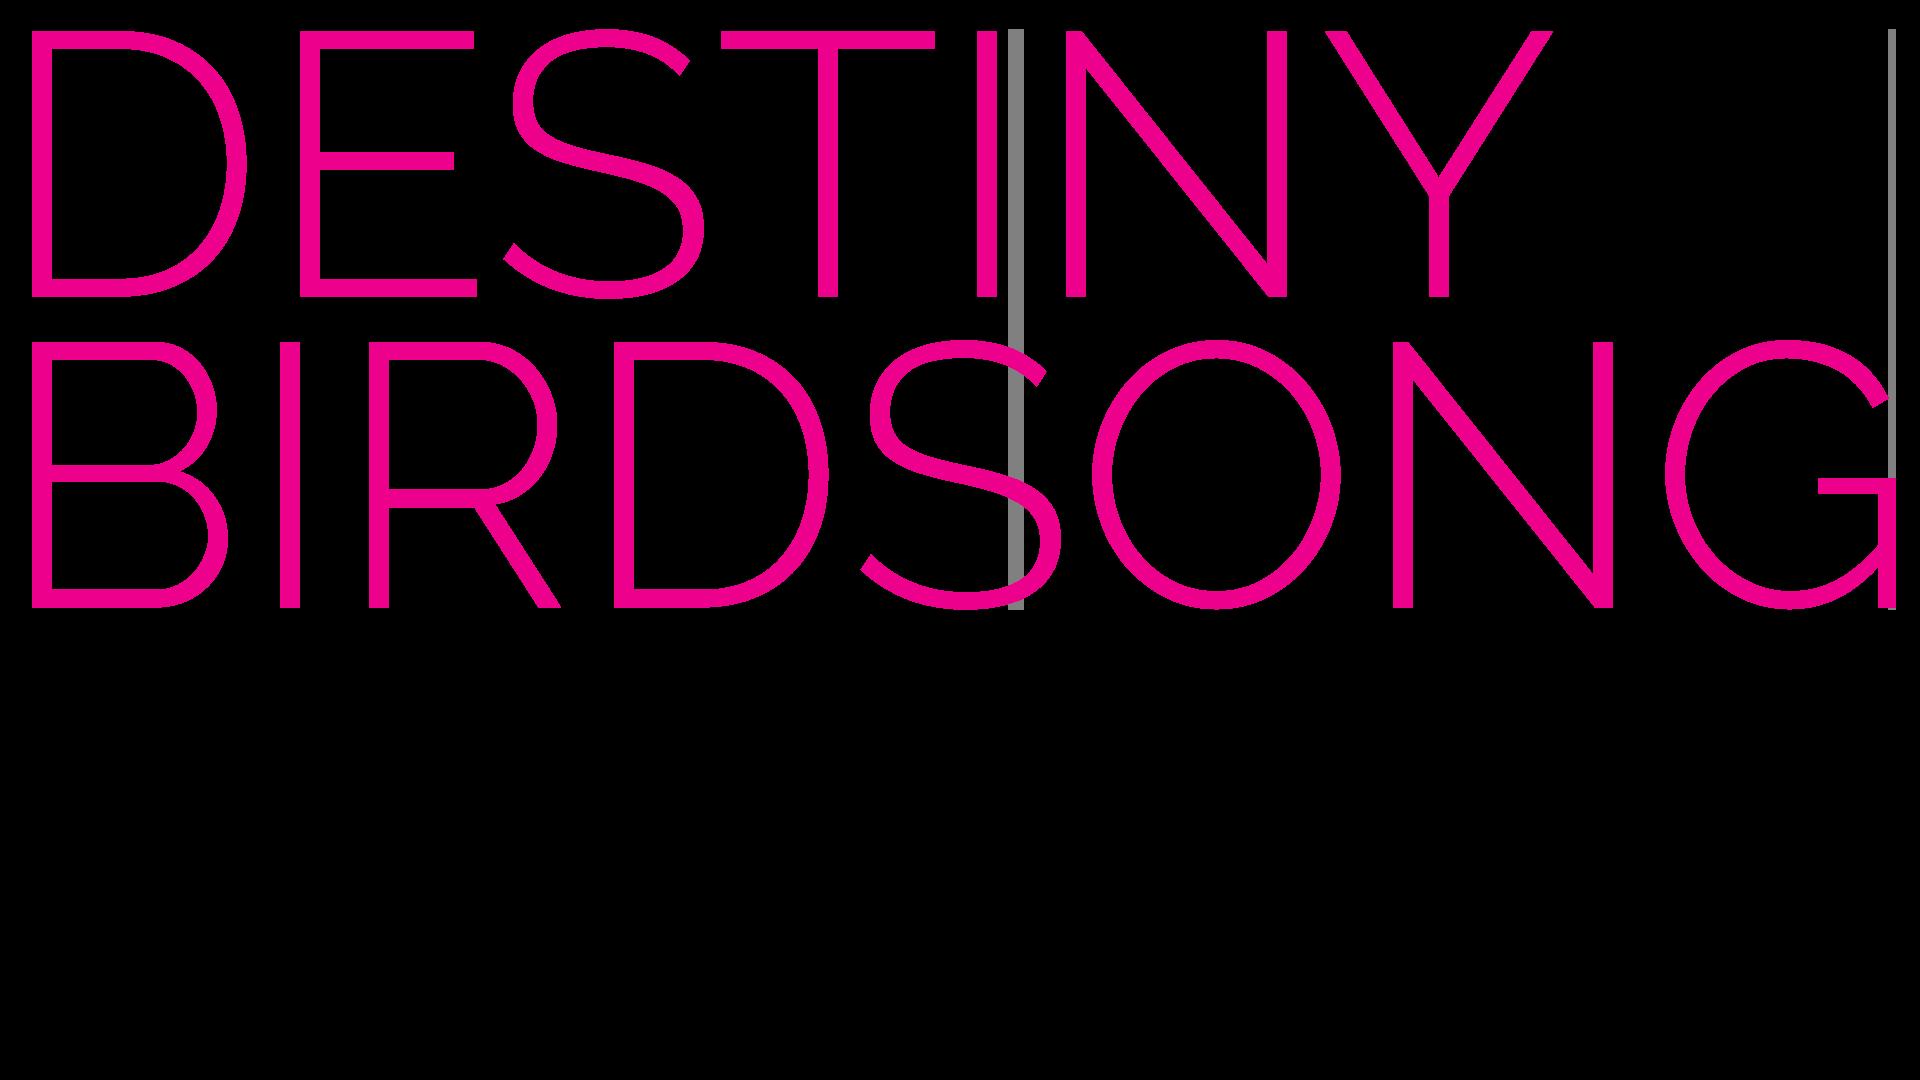 Destiny Birdsong